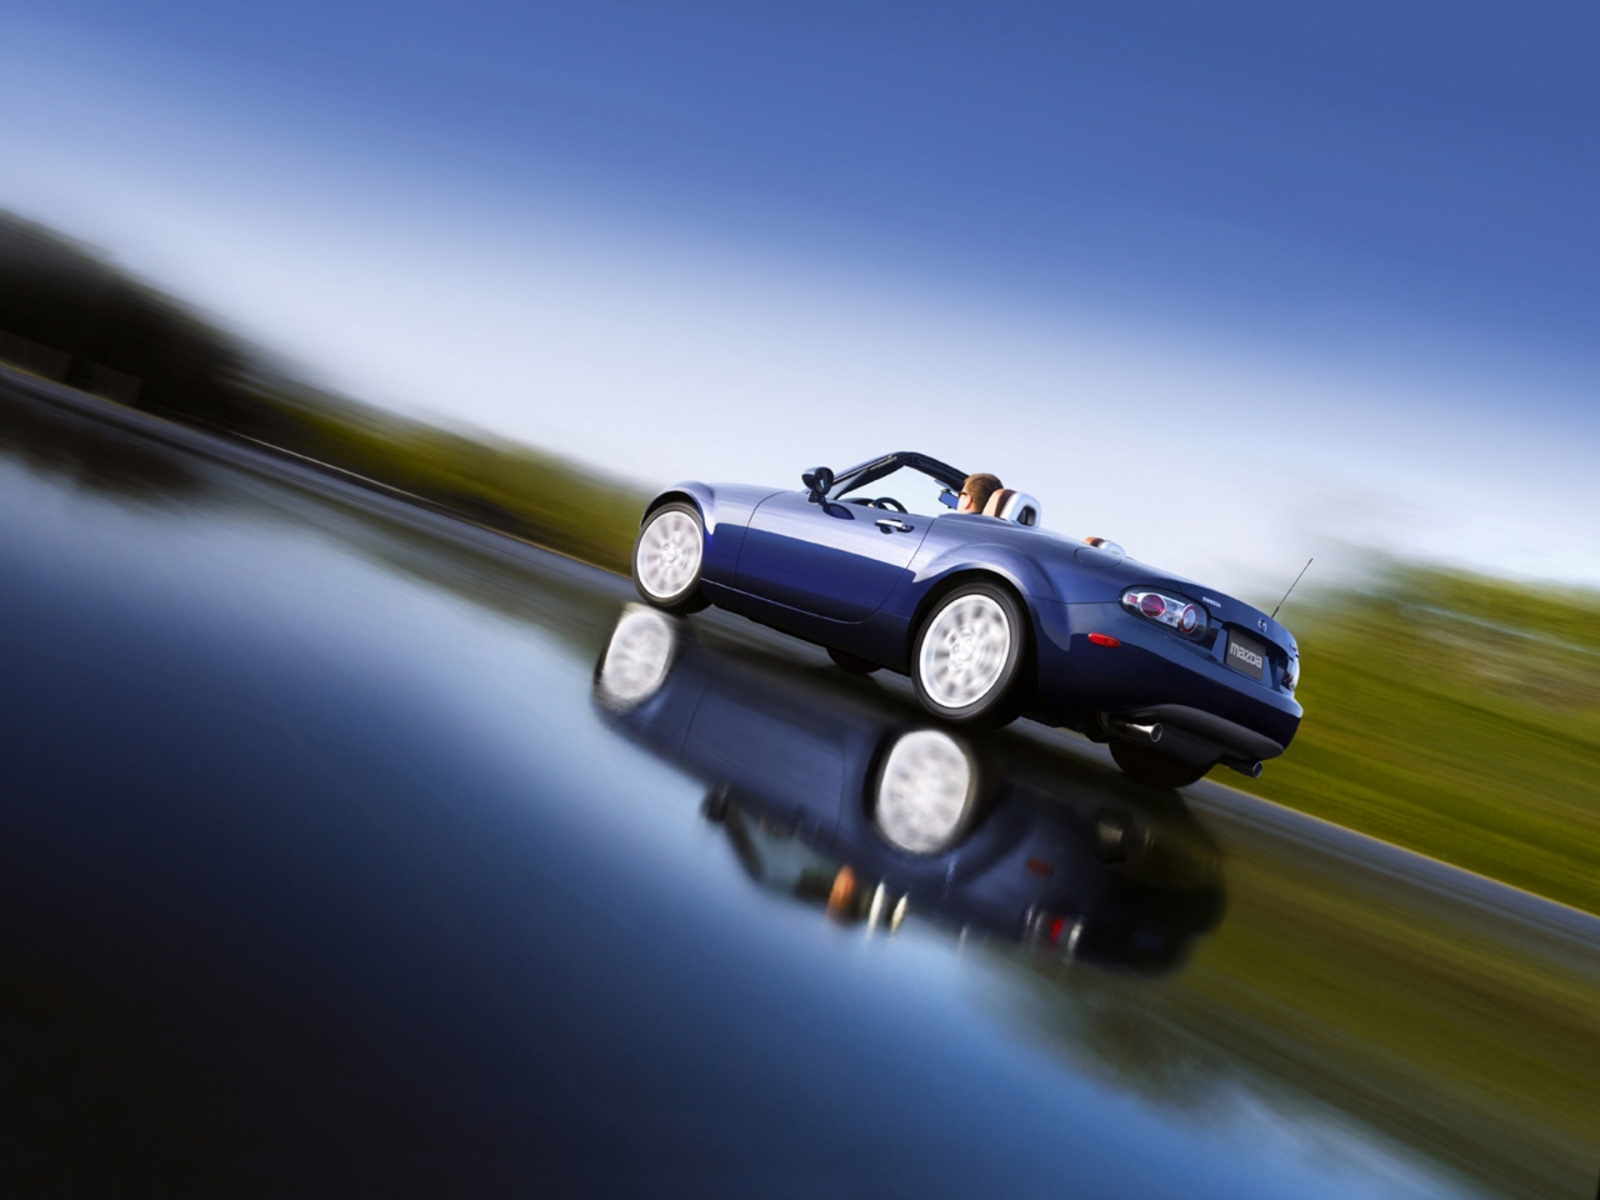 2008 Mazda MX-5 Miata Image